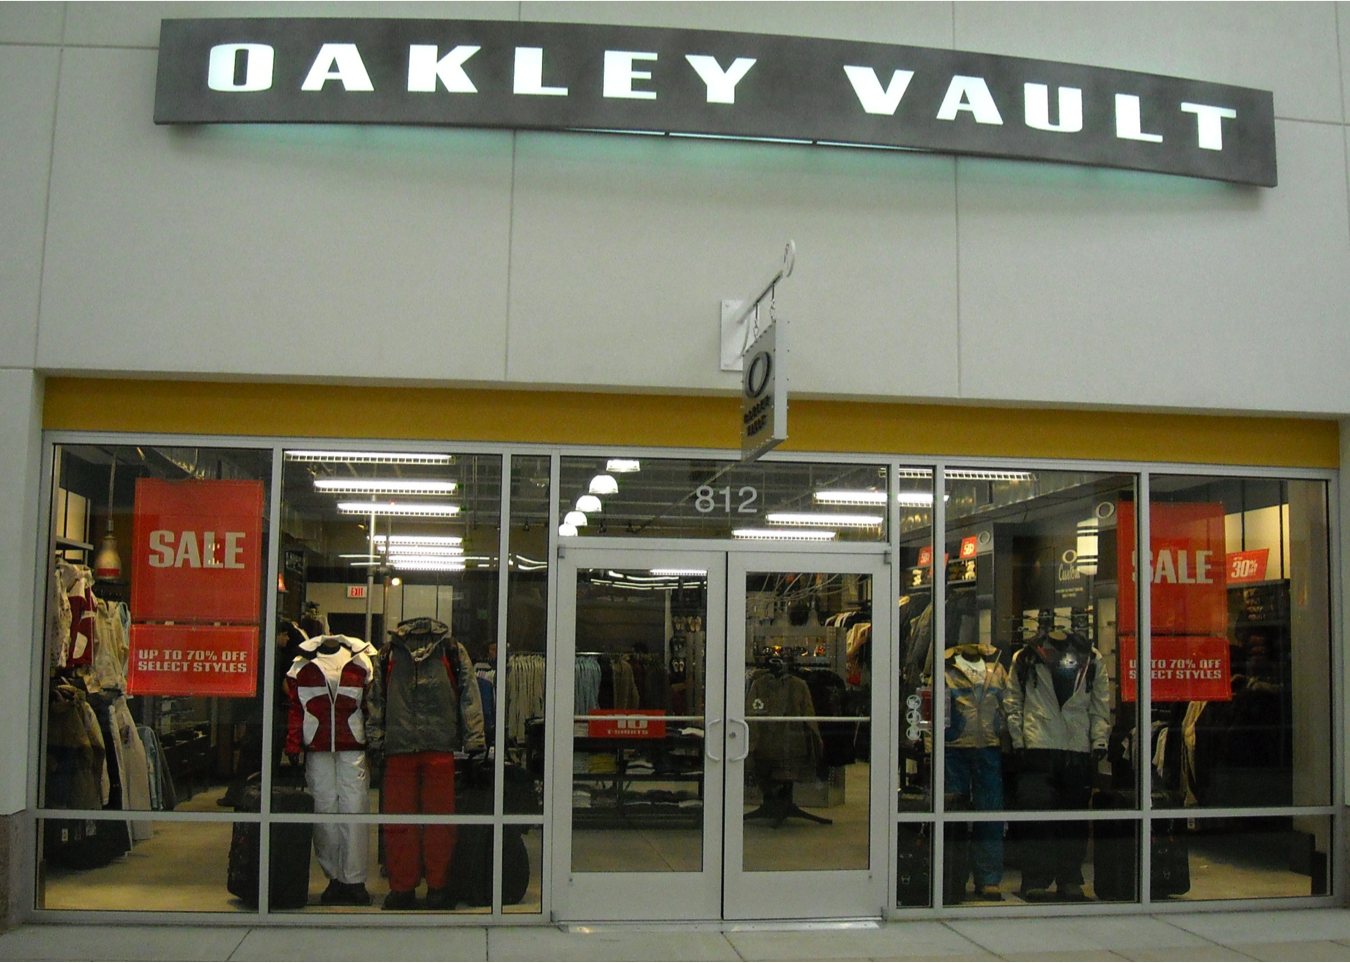 c3ccb07b23 Oakley Vault 1 Premium Outlet Blvd Ste 812